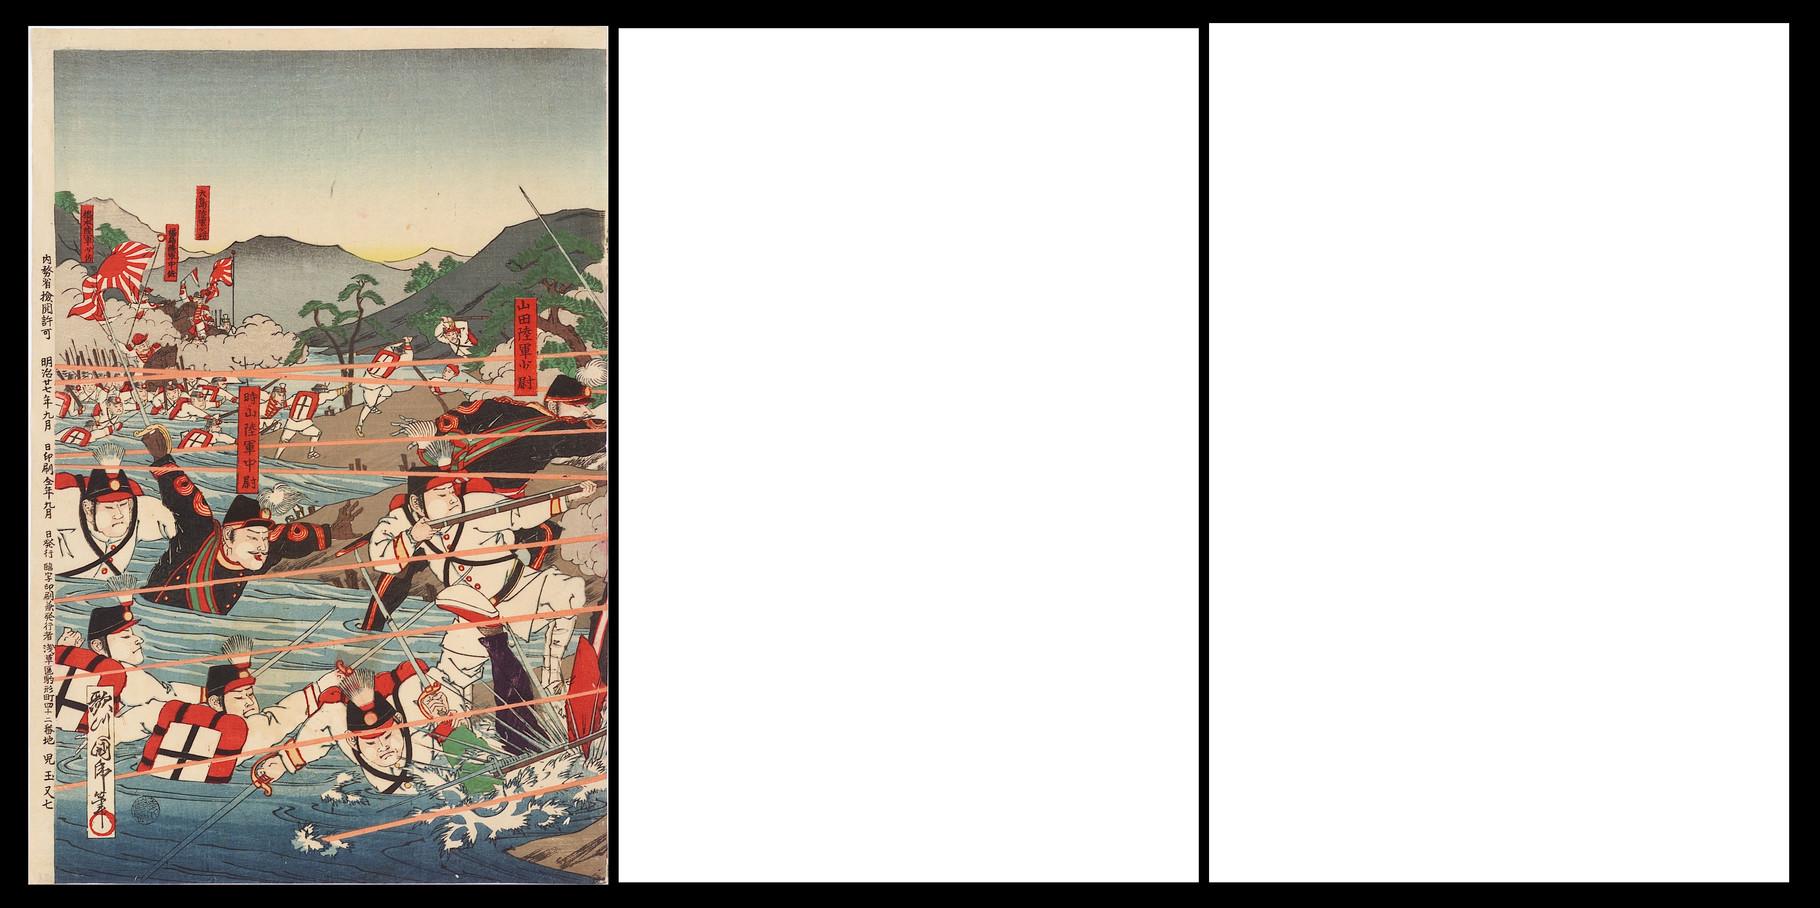 静岡県立中央図書館 蔵 当ページの作品